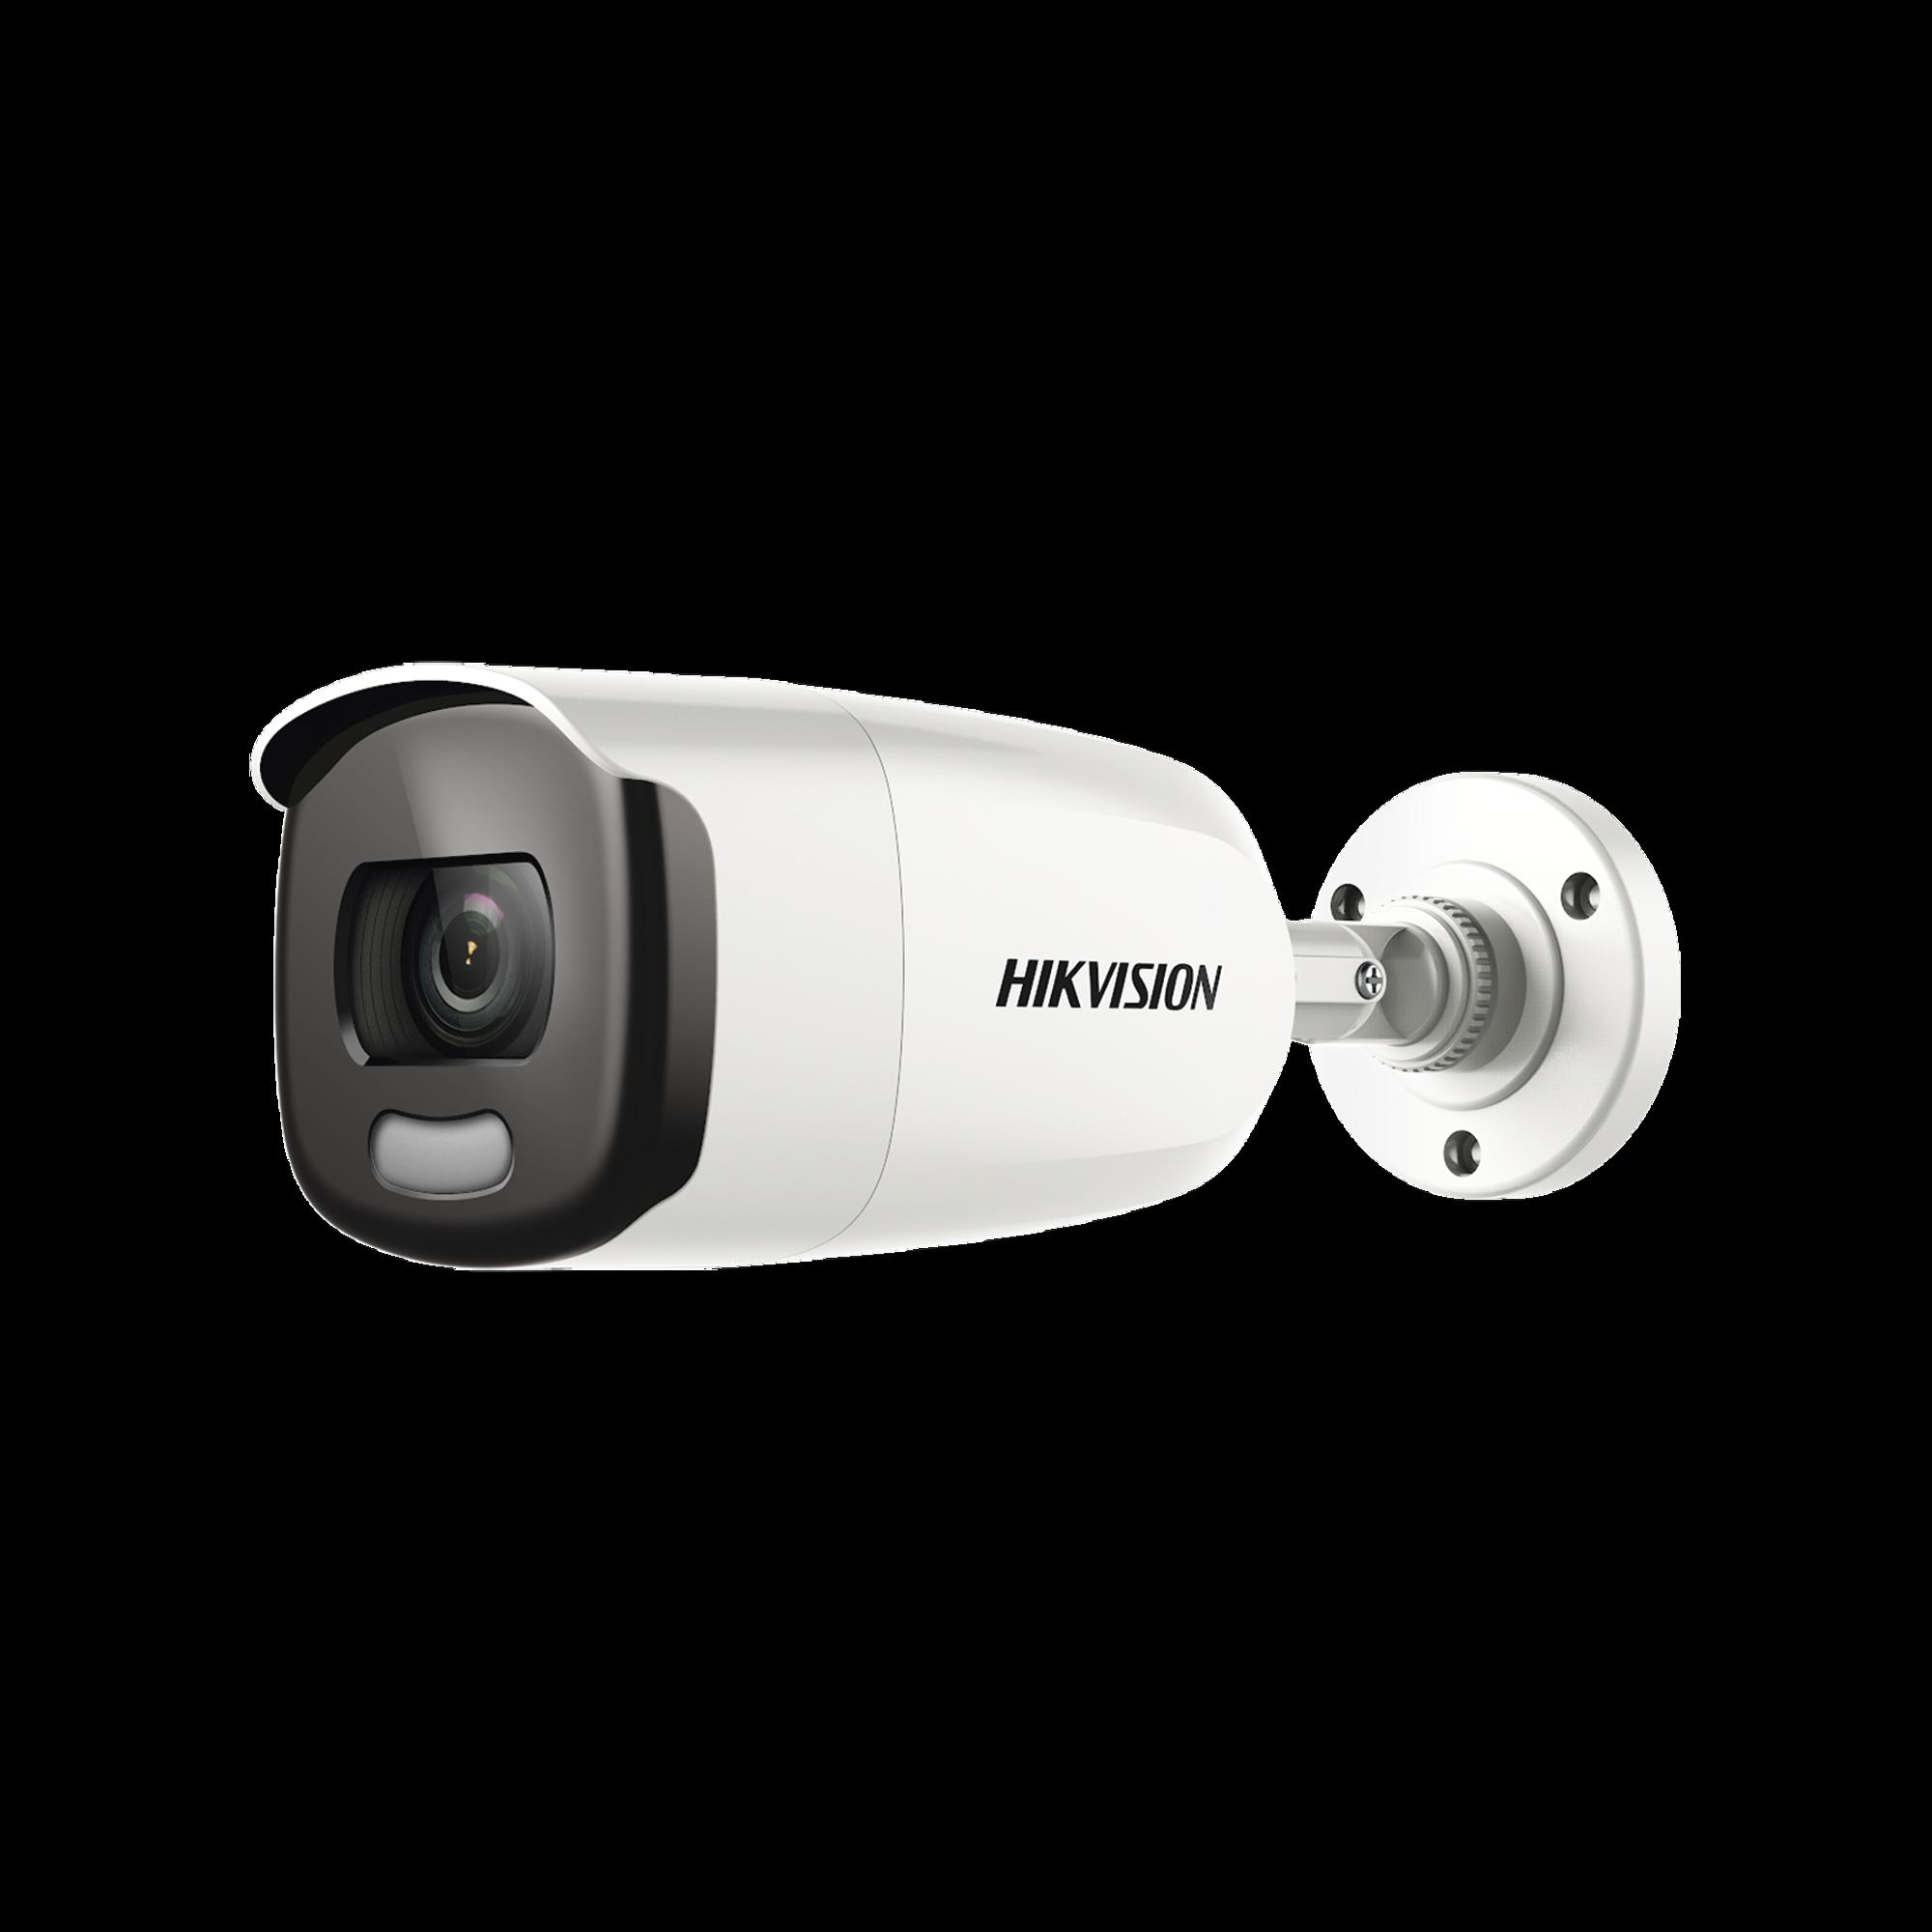 Bullet TURBO 1080p / Gran Cobertura / Lente 3.6 mm / IMAGEN A COLOR SIEMPRE / Luz Blanca 40 mts / Exterior IP67